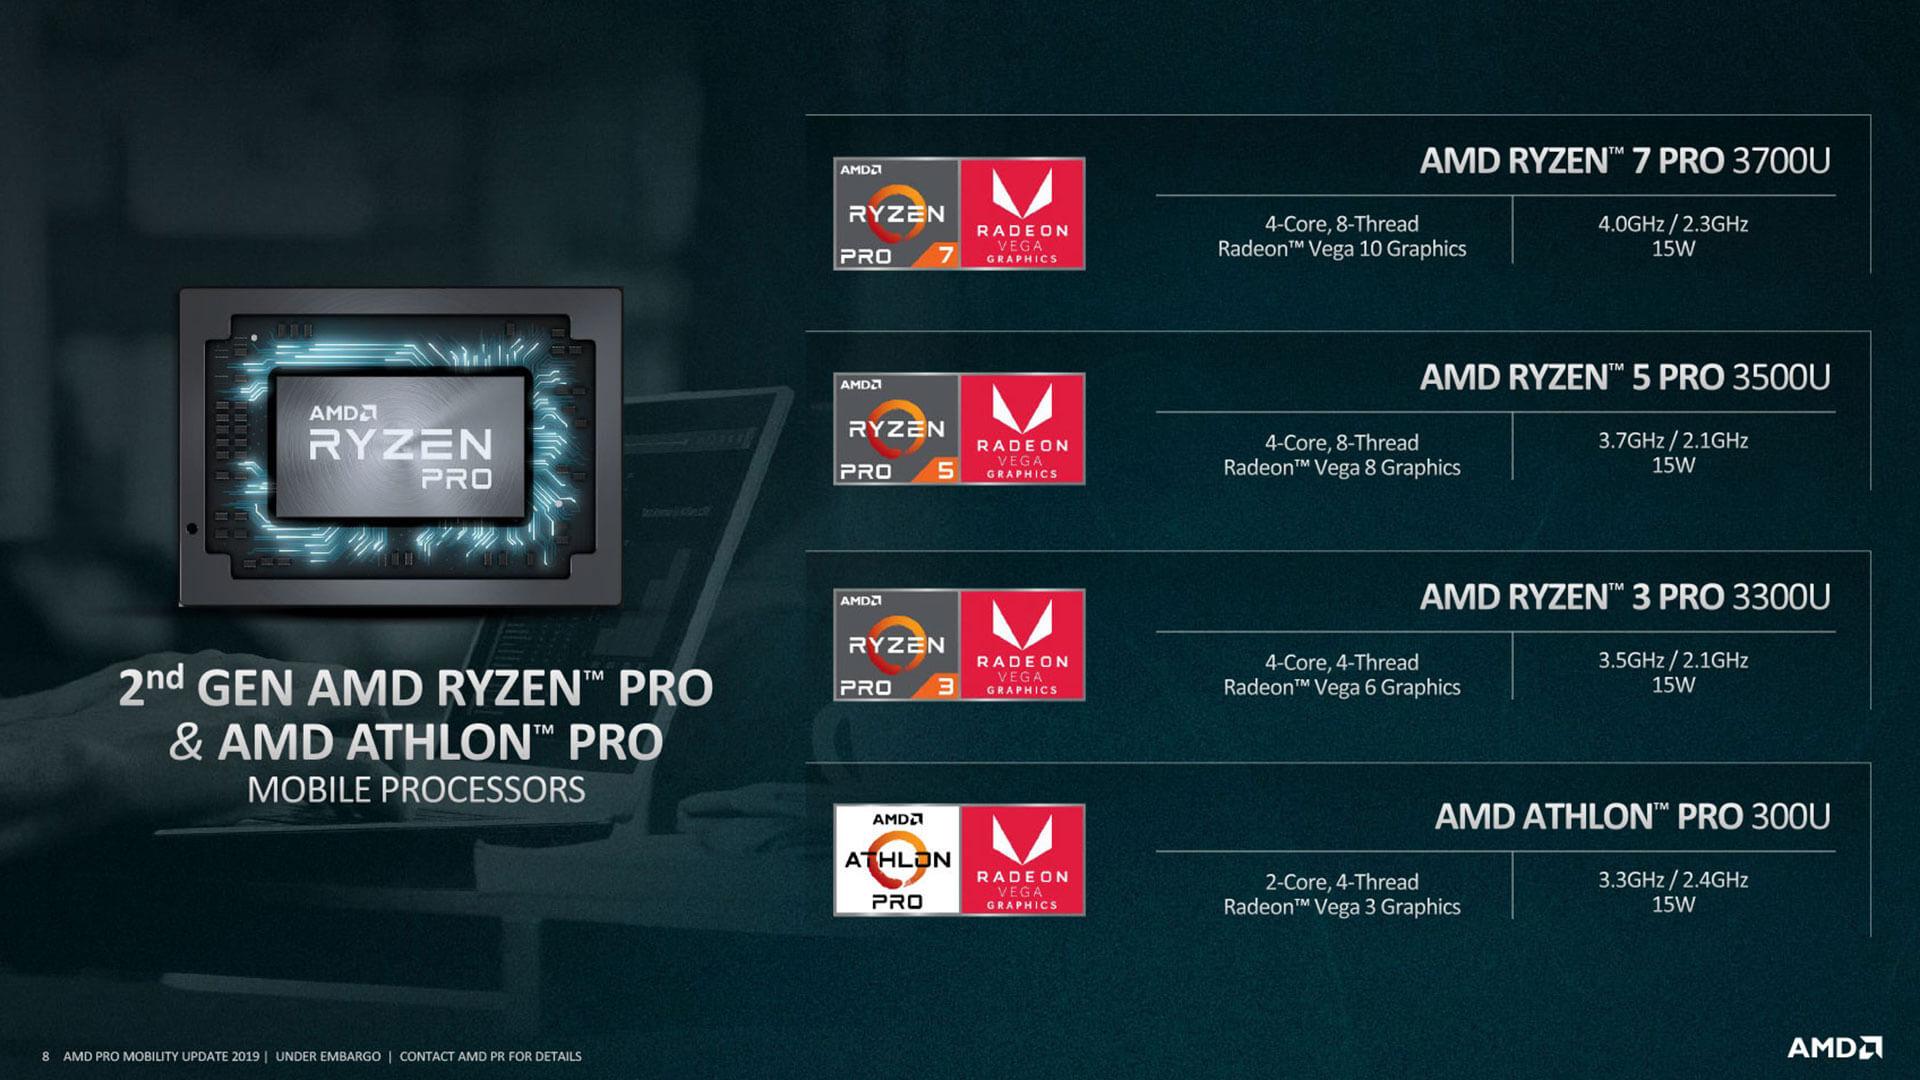 AMD-Pro-7